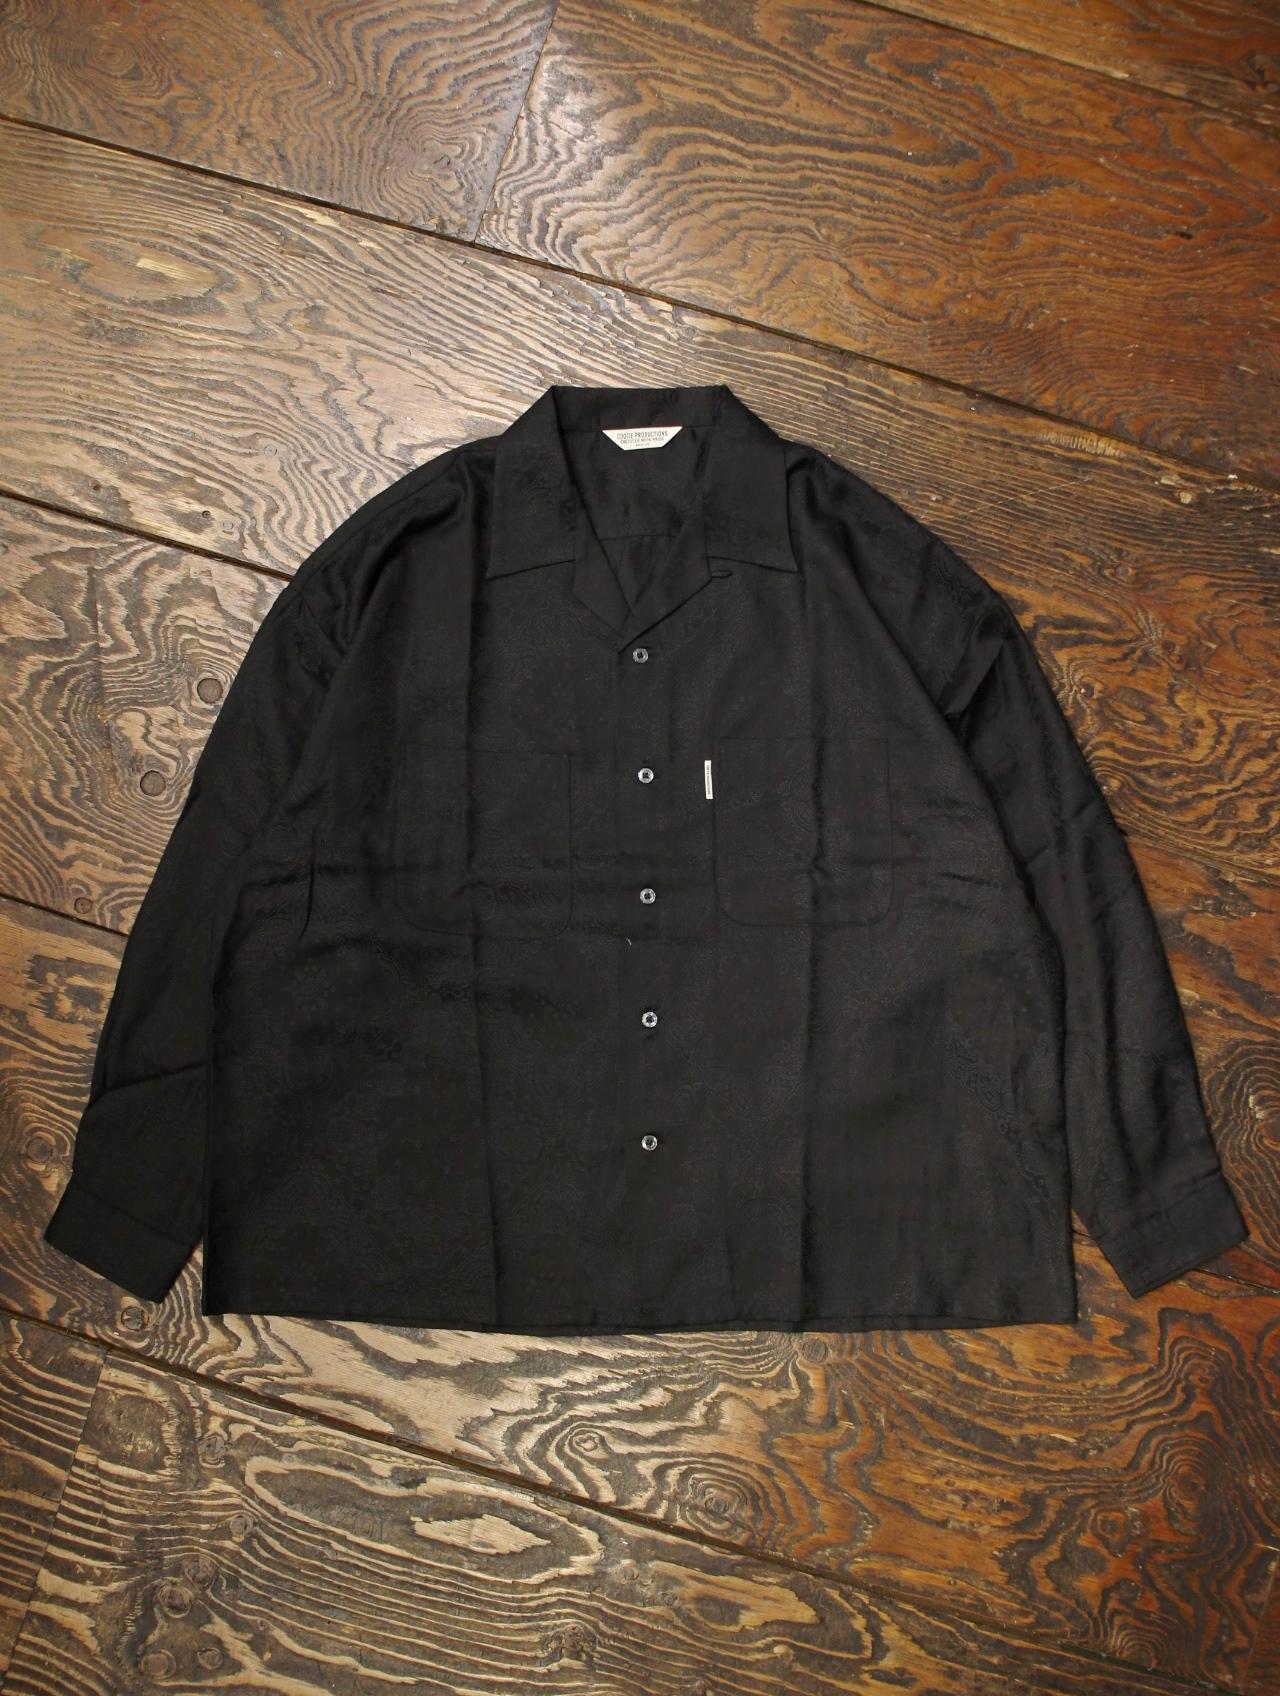 COOTIE  「 Bandana Jacquard Open-Neck L/S Shirt 」 オープンカラージャガードシャツ